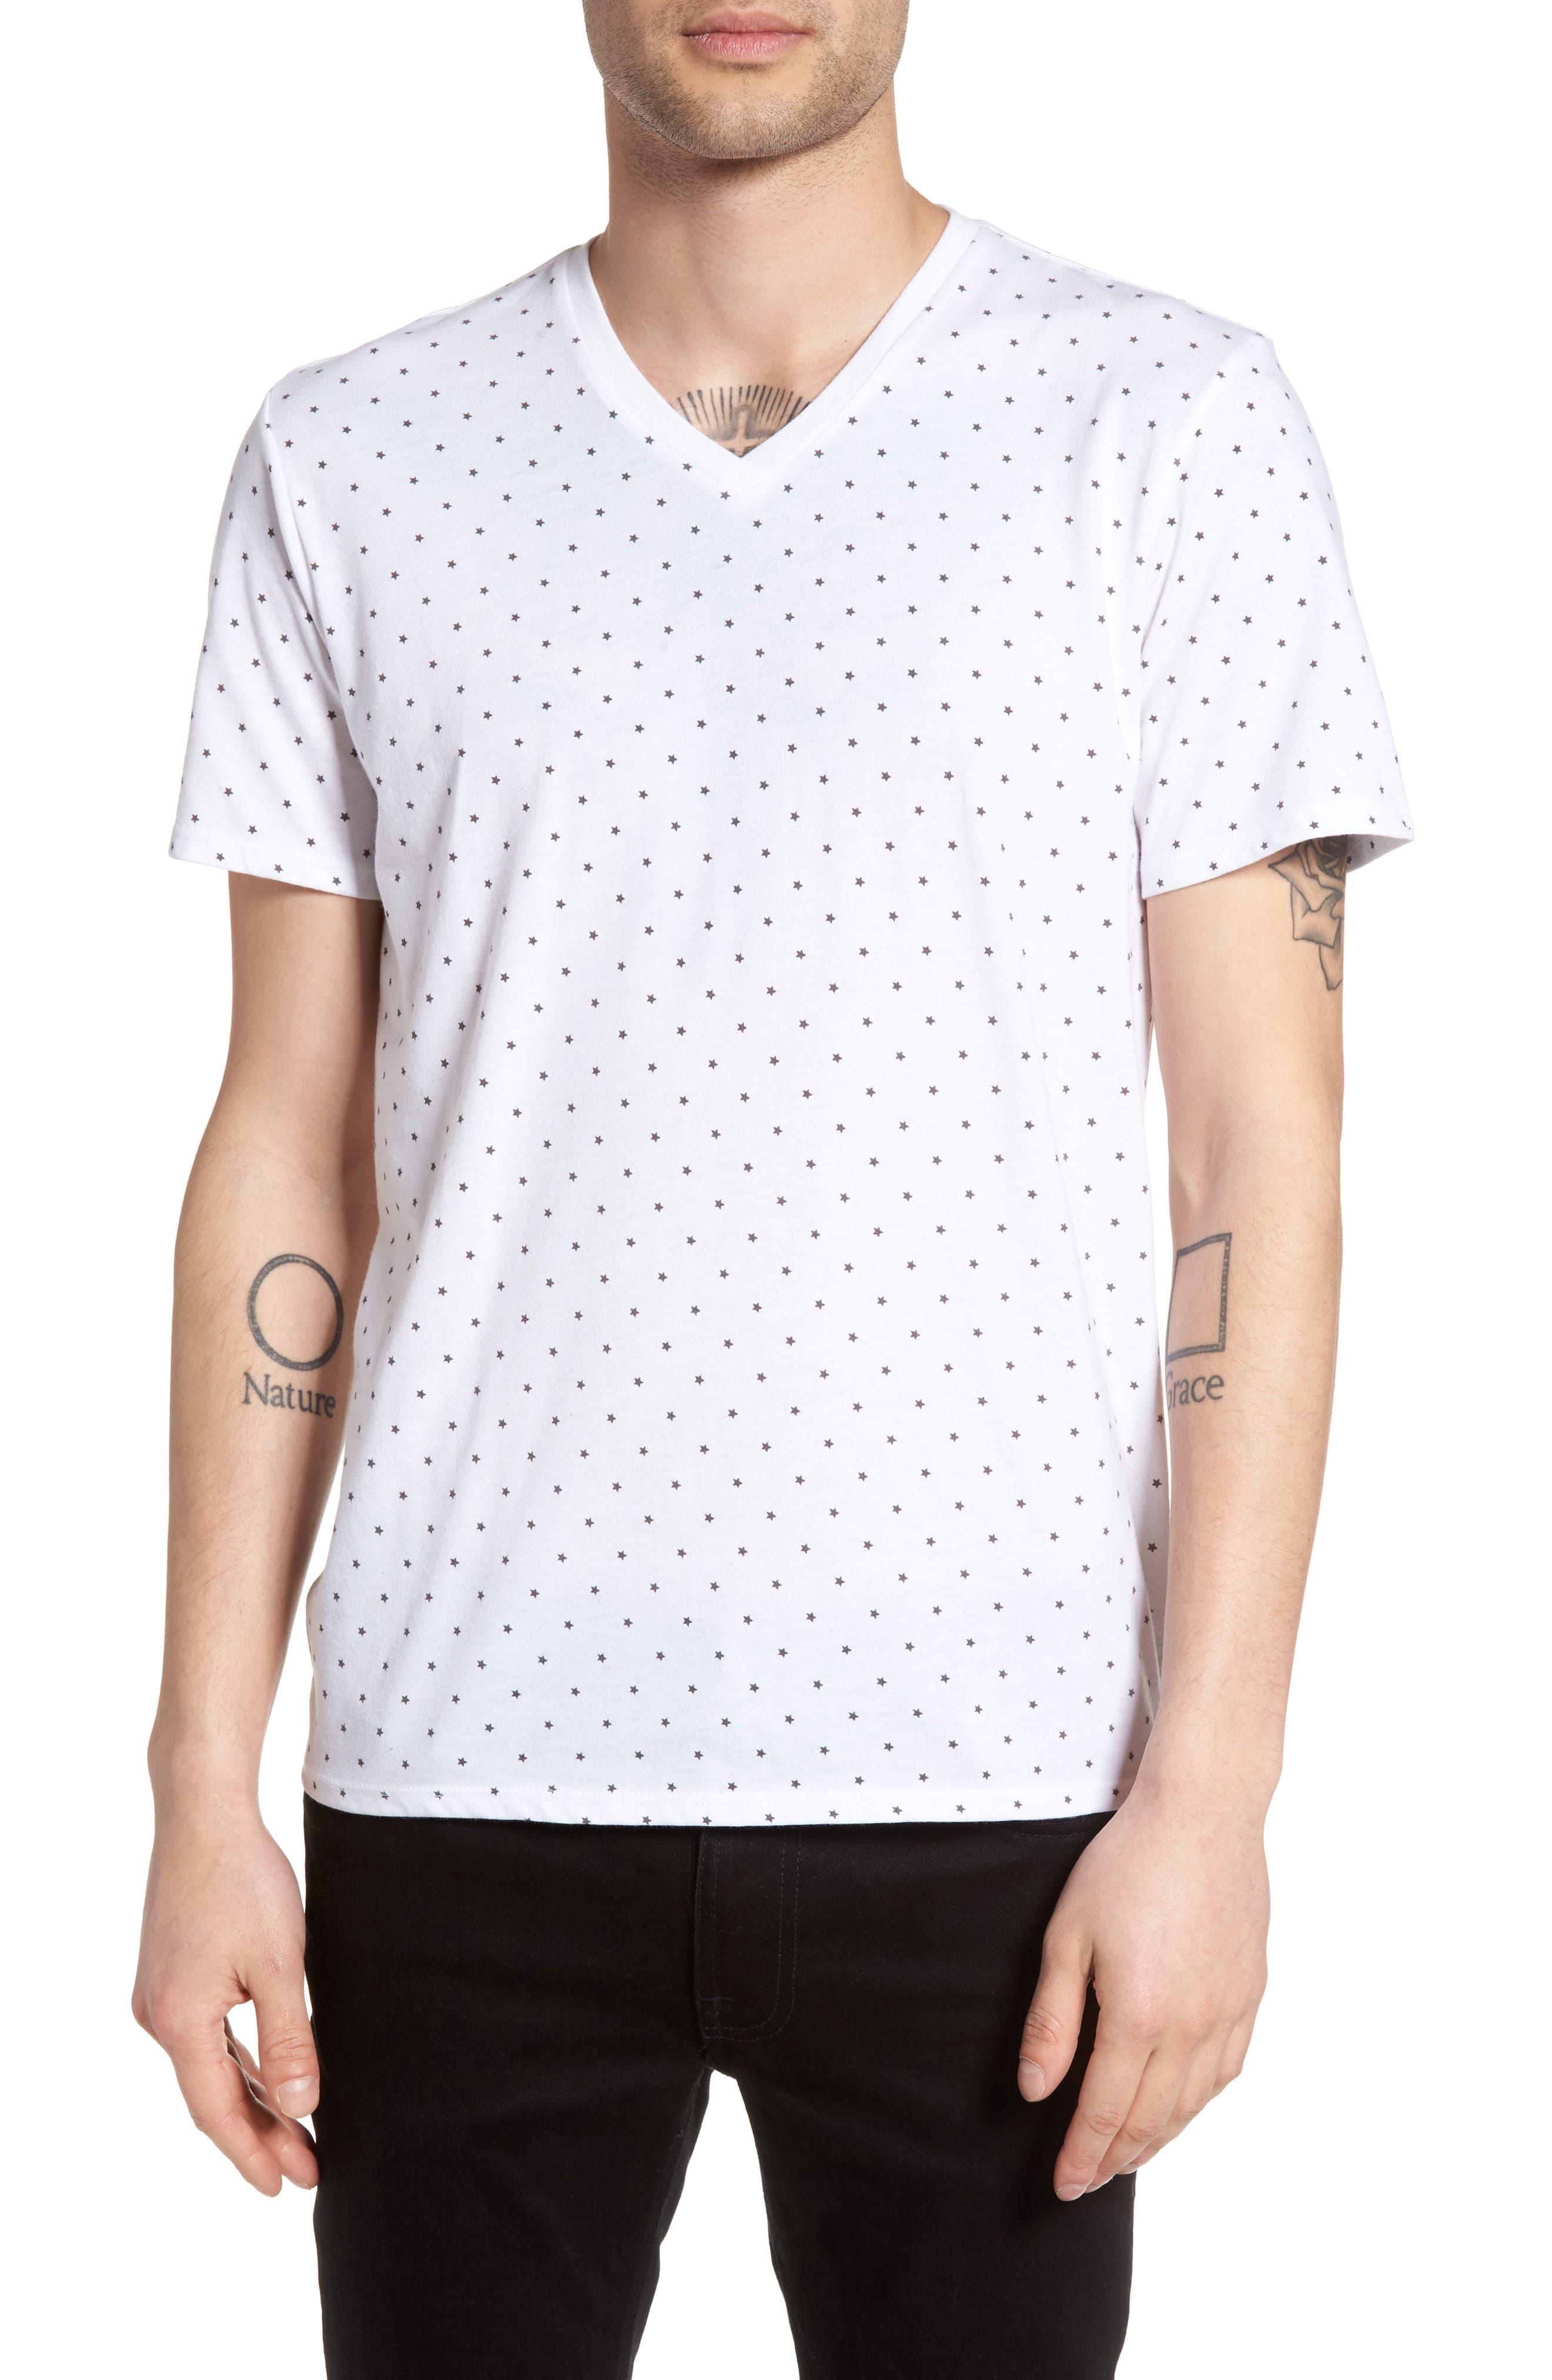 The Rail Print V-Neck T-Shirt (2 for $30)